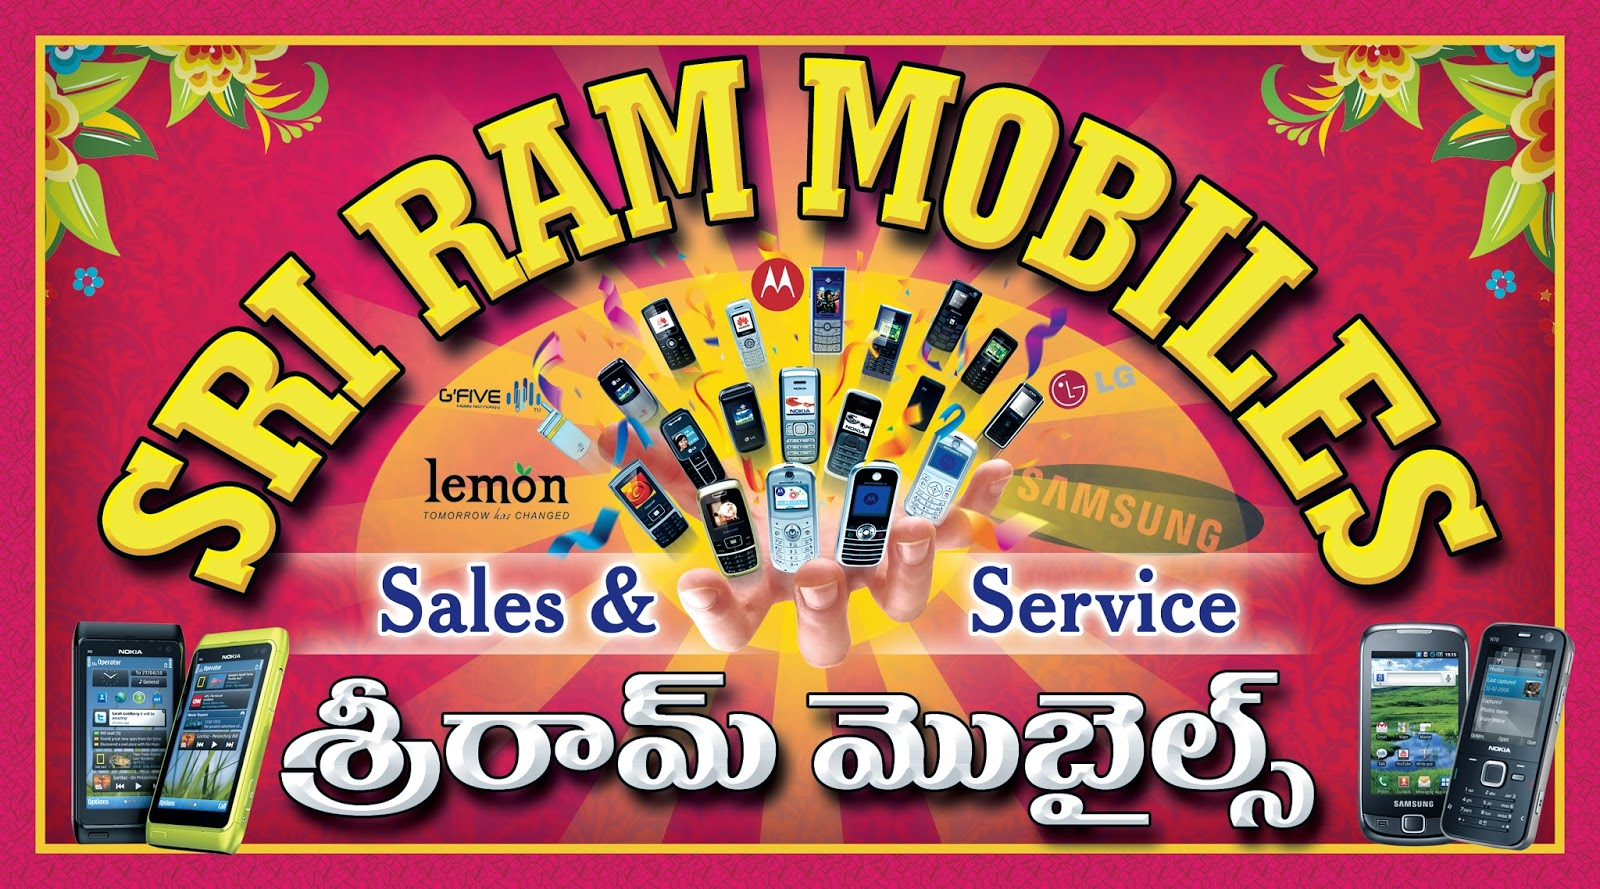 Sri Ram Mobiles Sign Board Psd Template Naveengfx